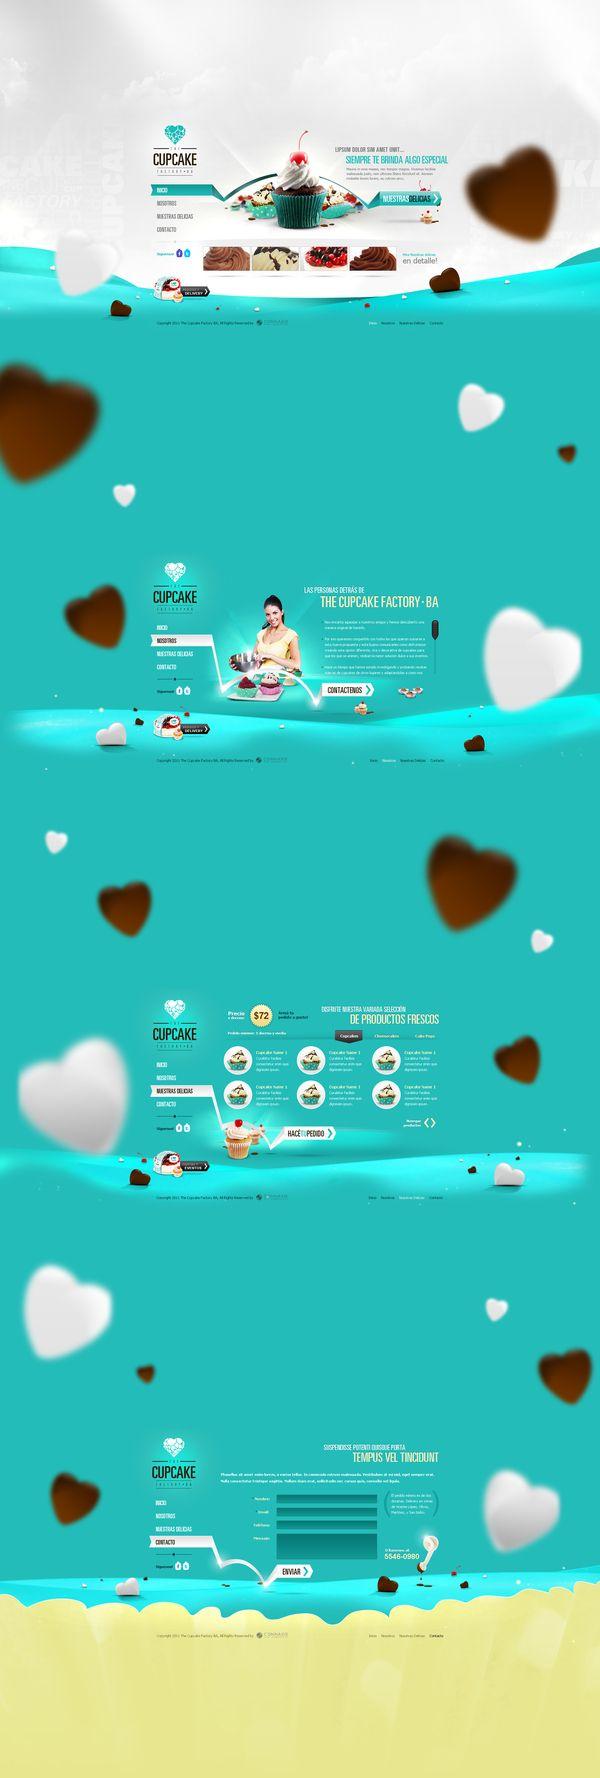 The Cupcake Factory - http://www.behance.net/gallery/Cupcake-Factory/5137463 | More Inspiration http://blog.logoswish.com/category/inspiration/ #web #design #inspiration